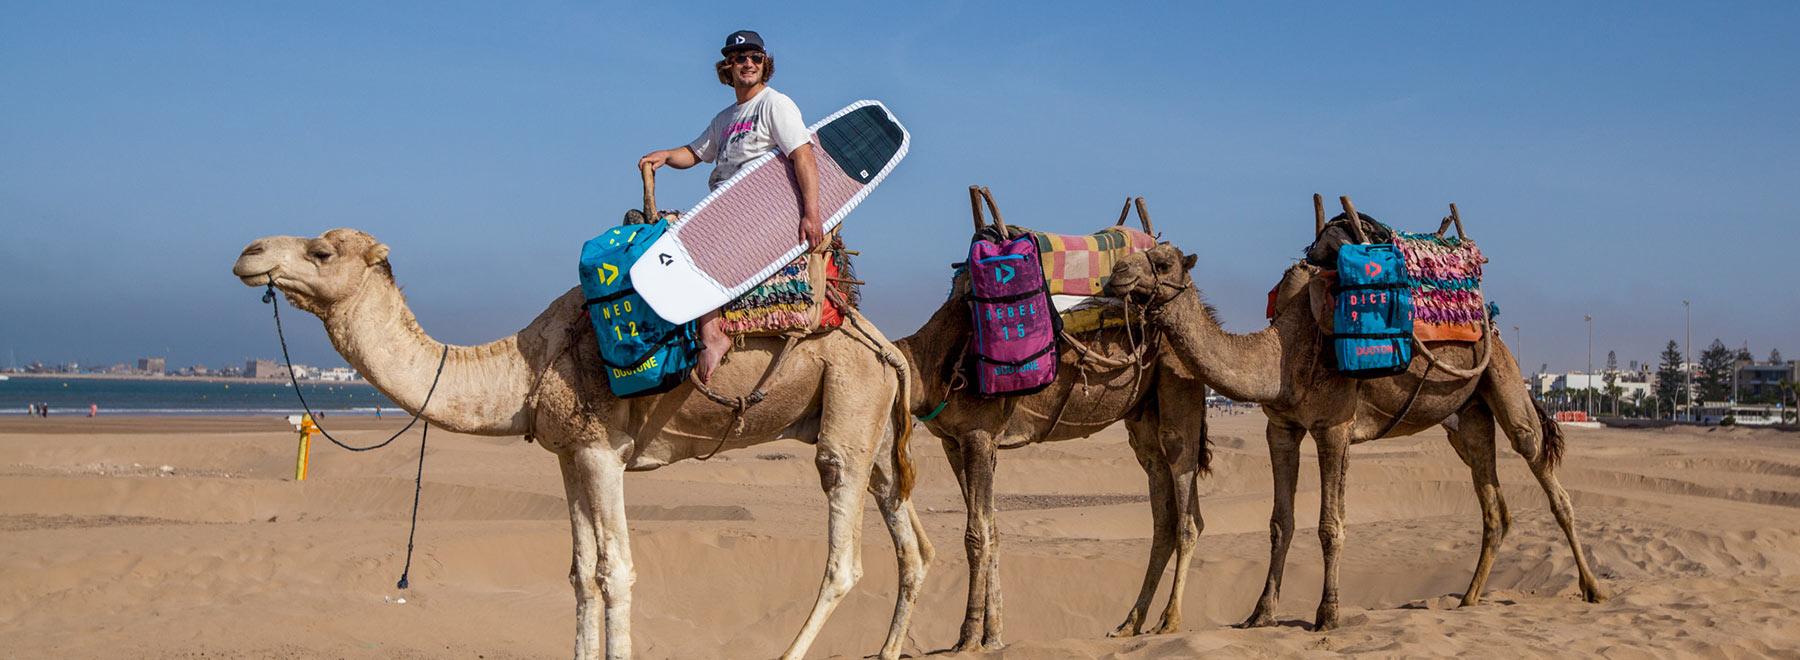 Essaouira-Kitesurfing in-Morocco